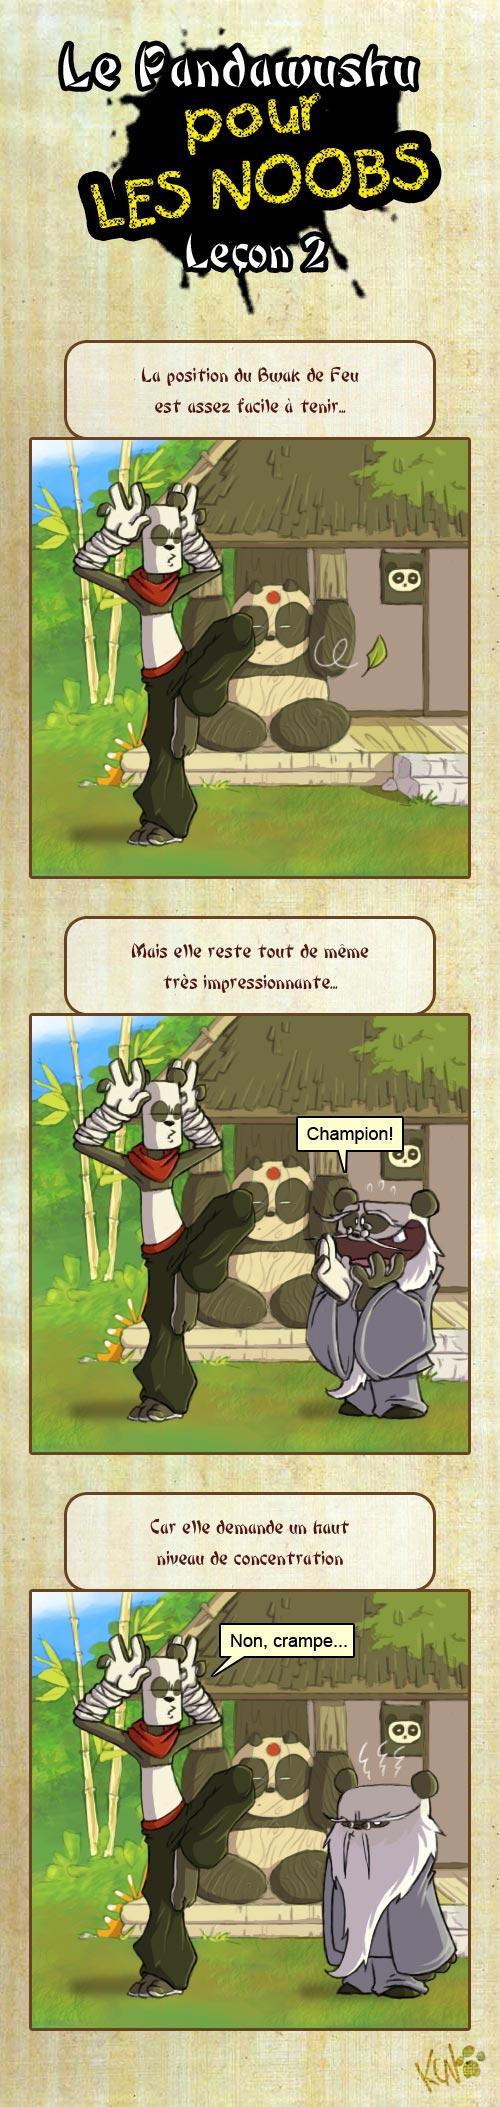 Le Pandawushu pour les Noobs Pandawushu02